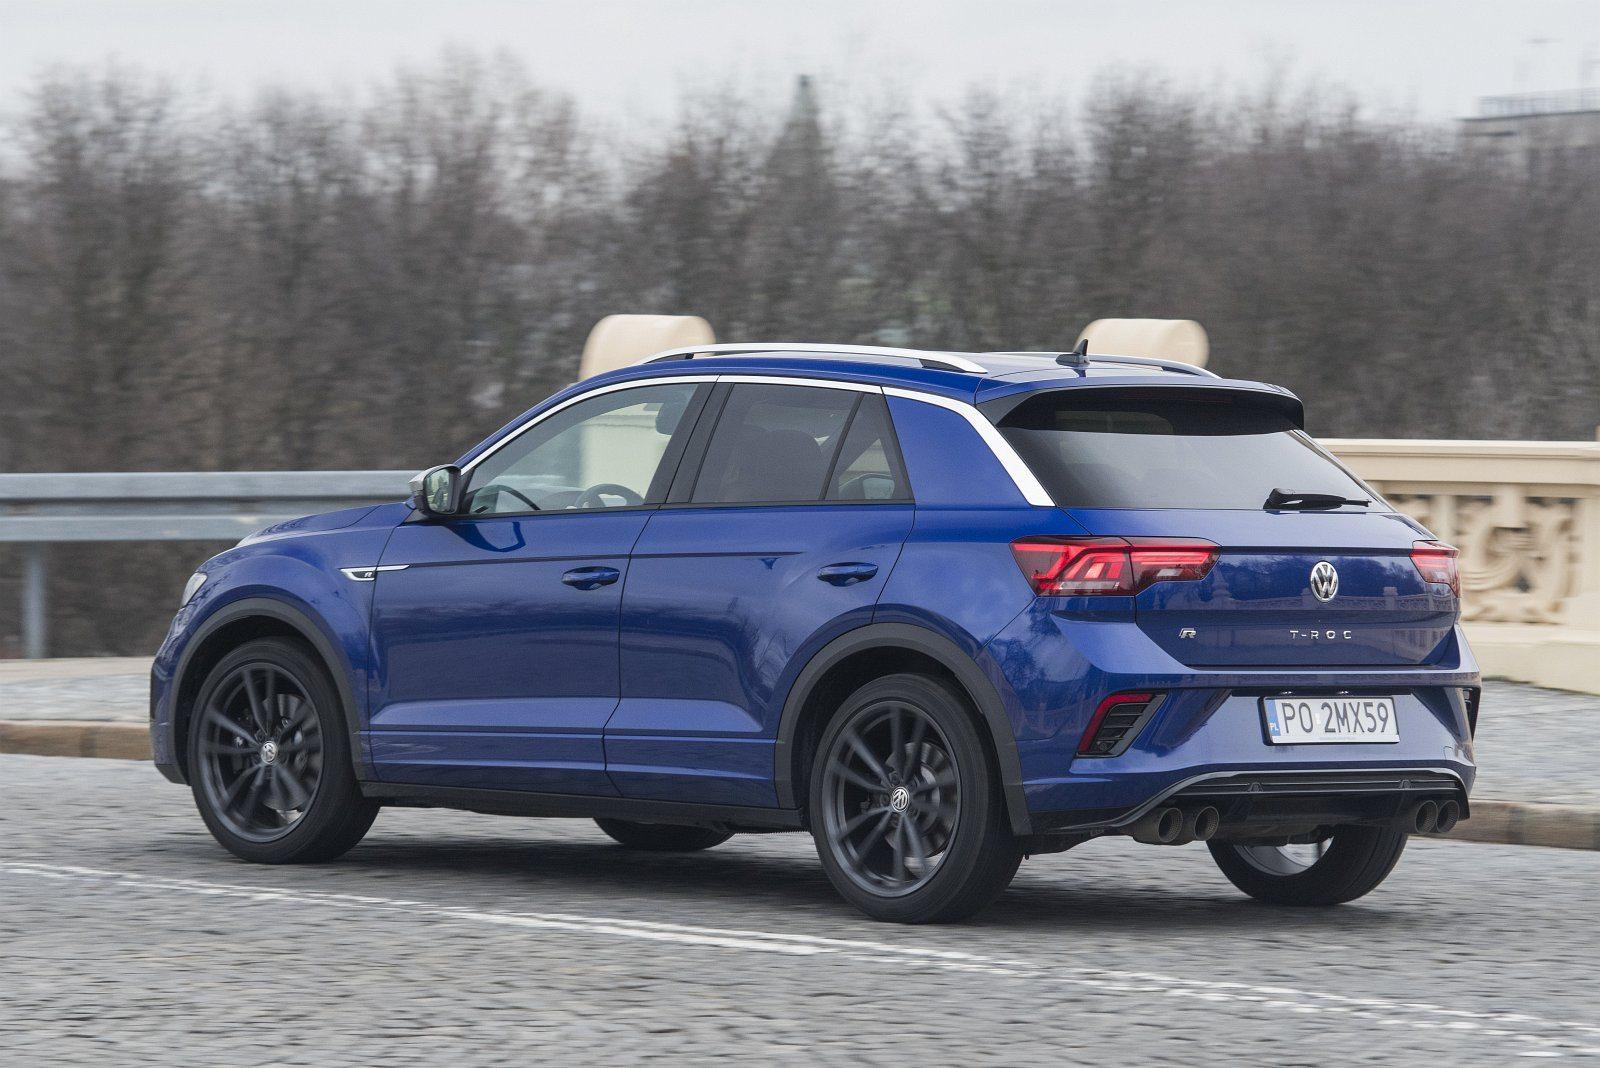 volkswagen vw t-roc 2020 test